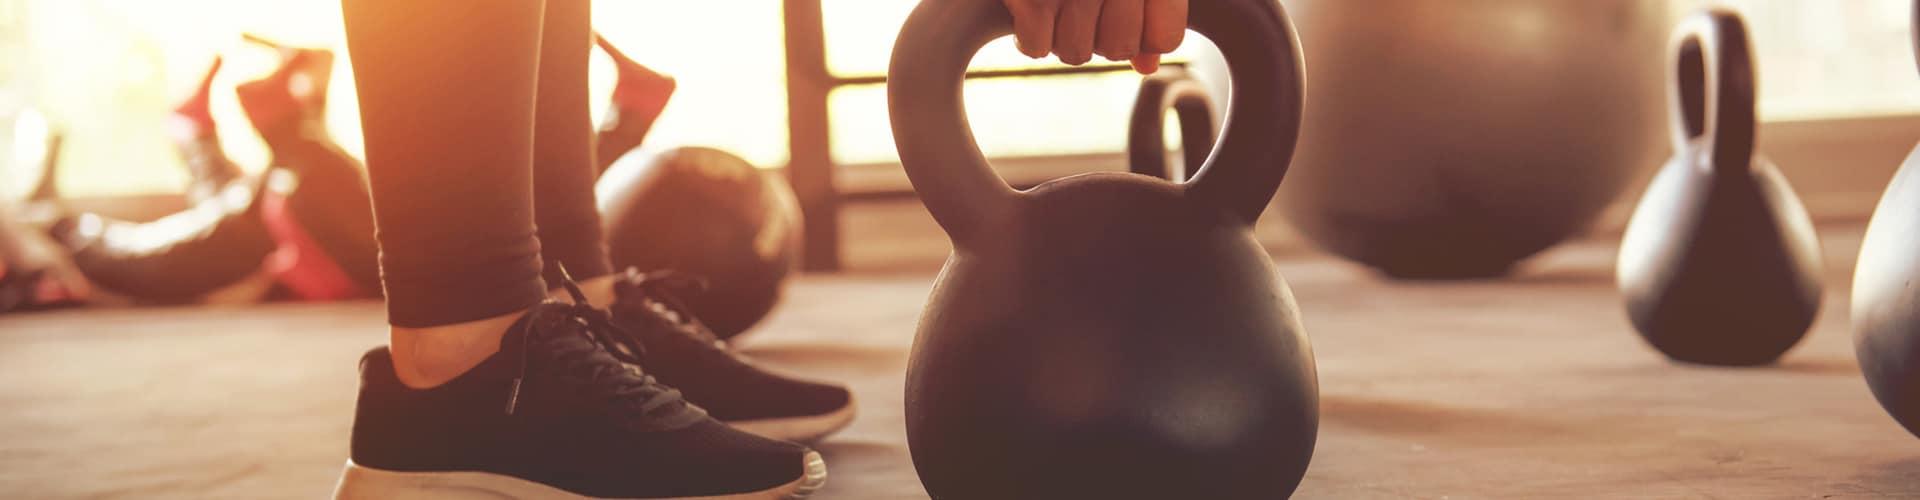 fitness e wellness a roma